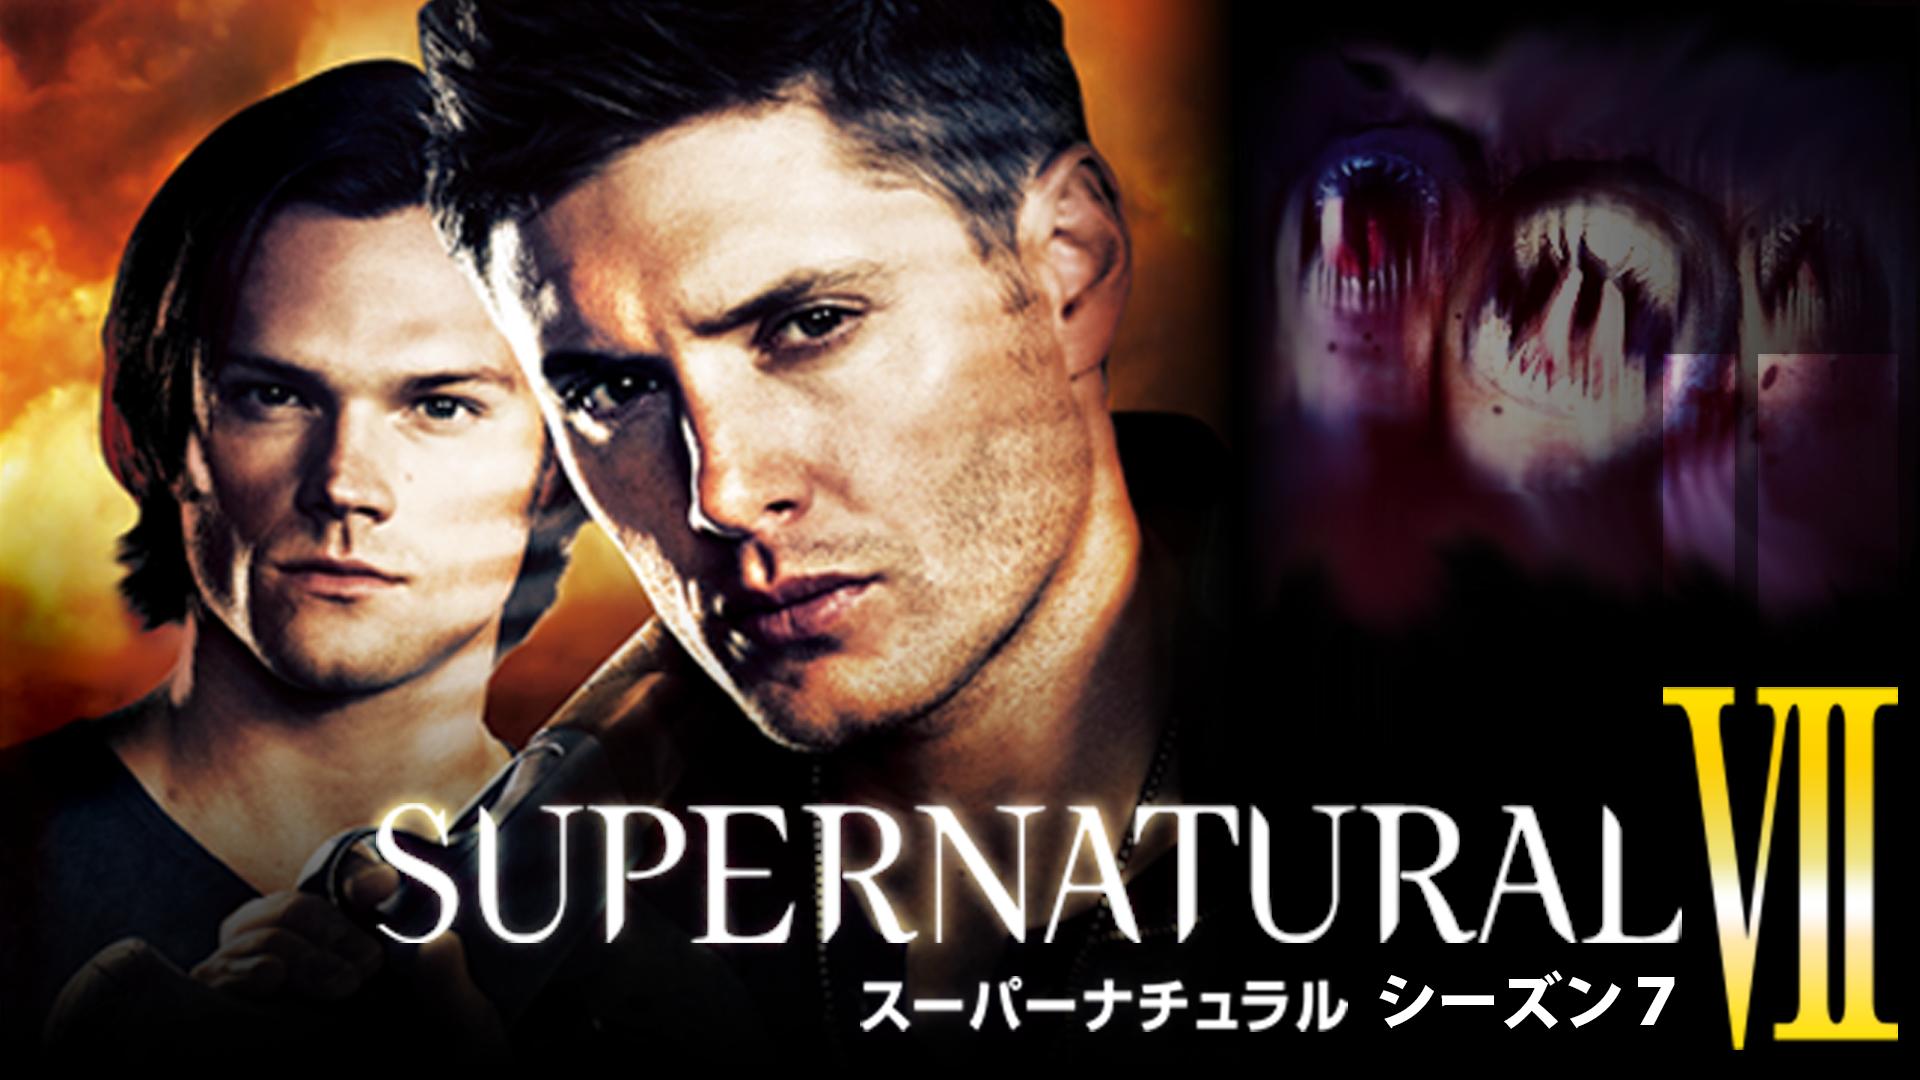 SUPERNATURAL/スーパーナチュラル シーズン7の動画 - SUPERNATURAL/スーパーナチュラル シーズン12